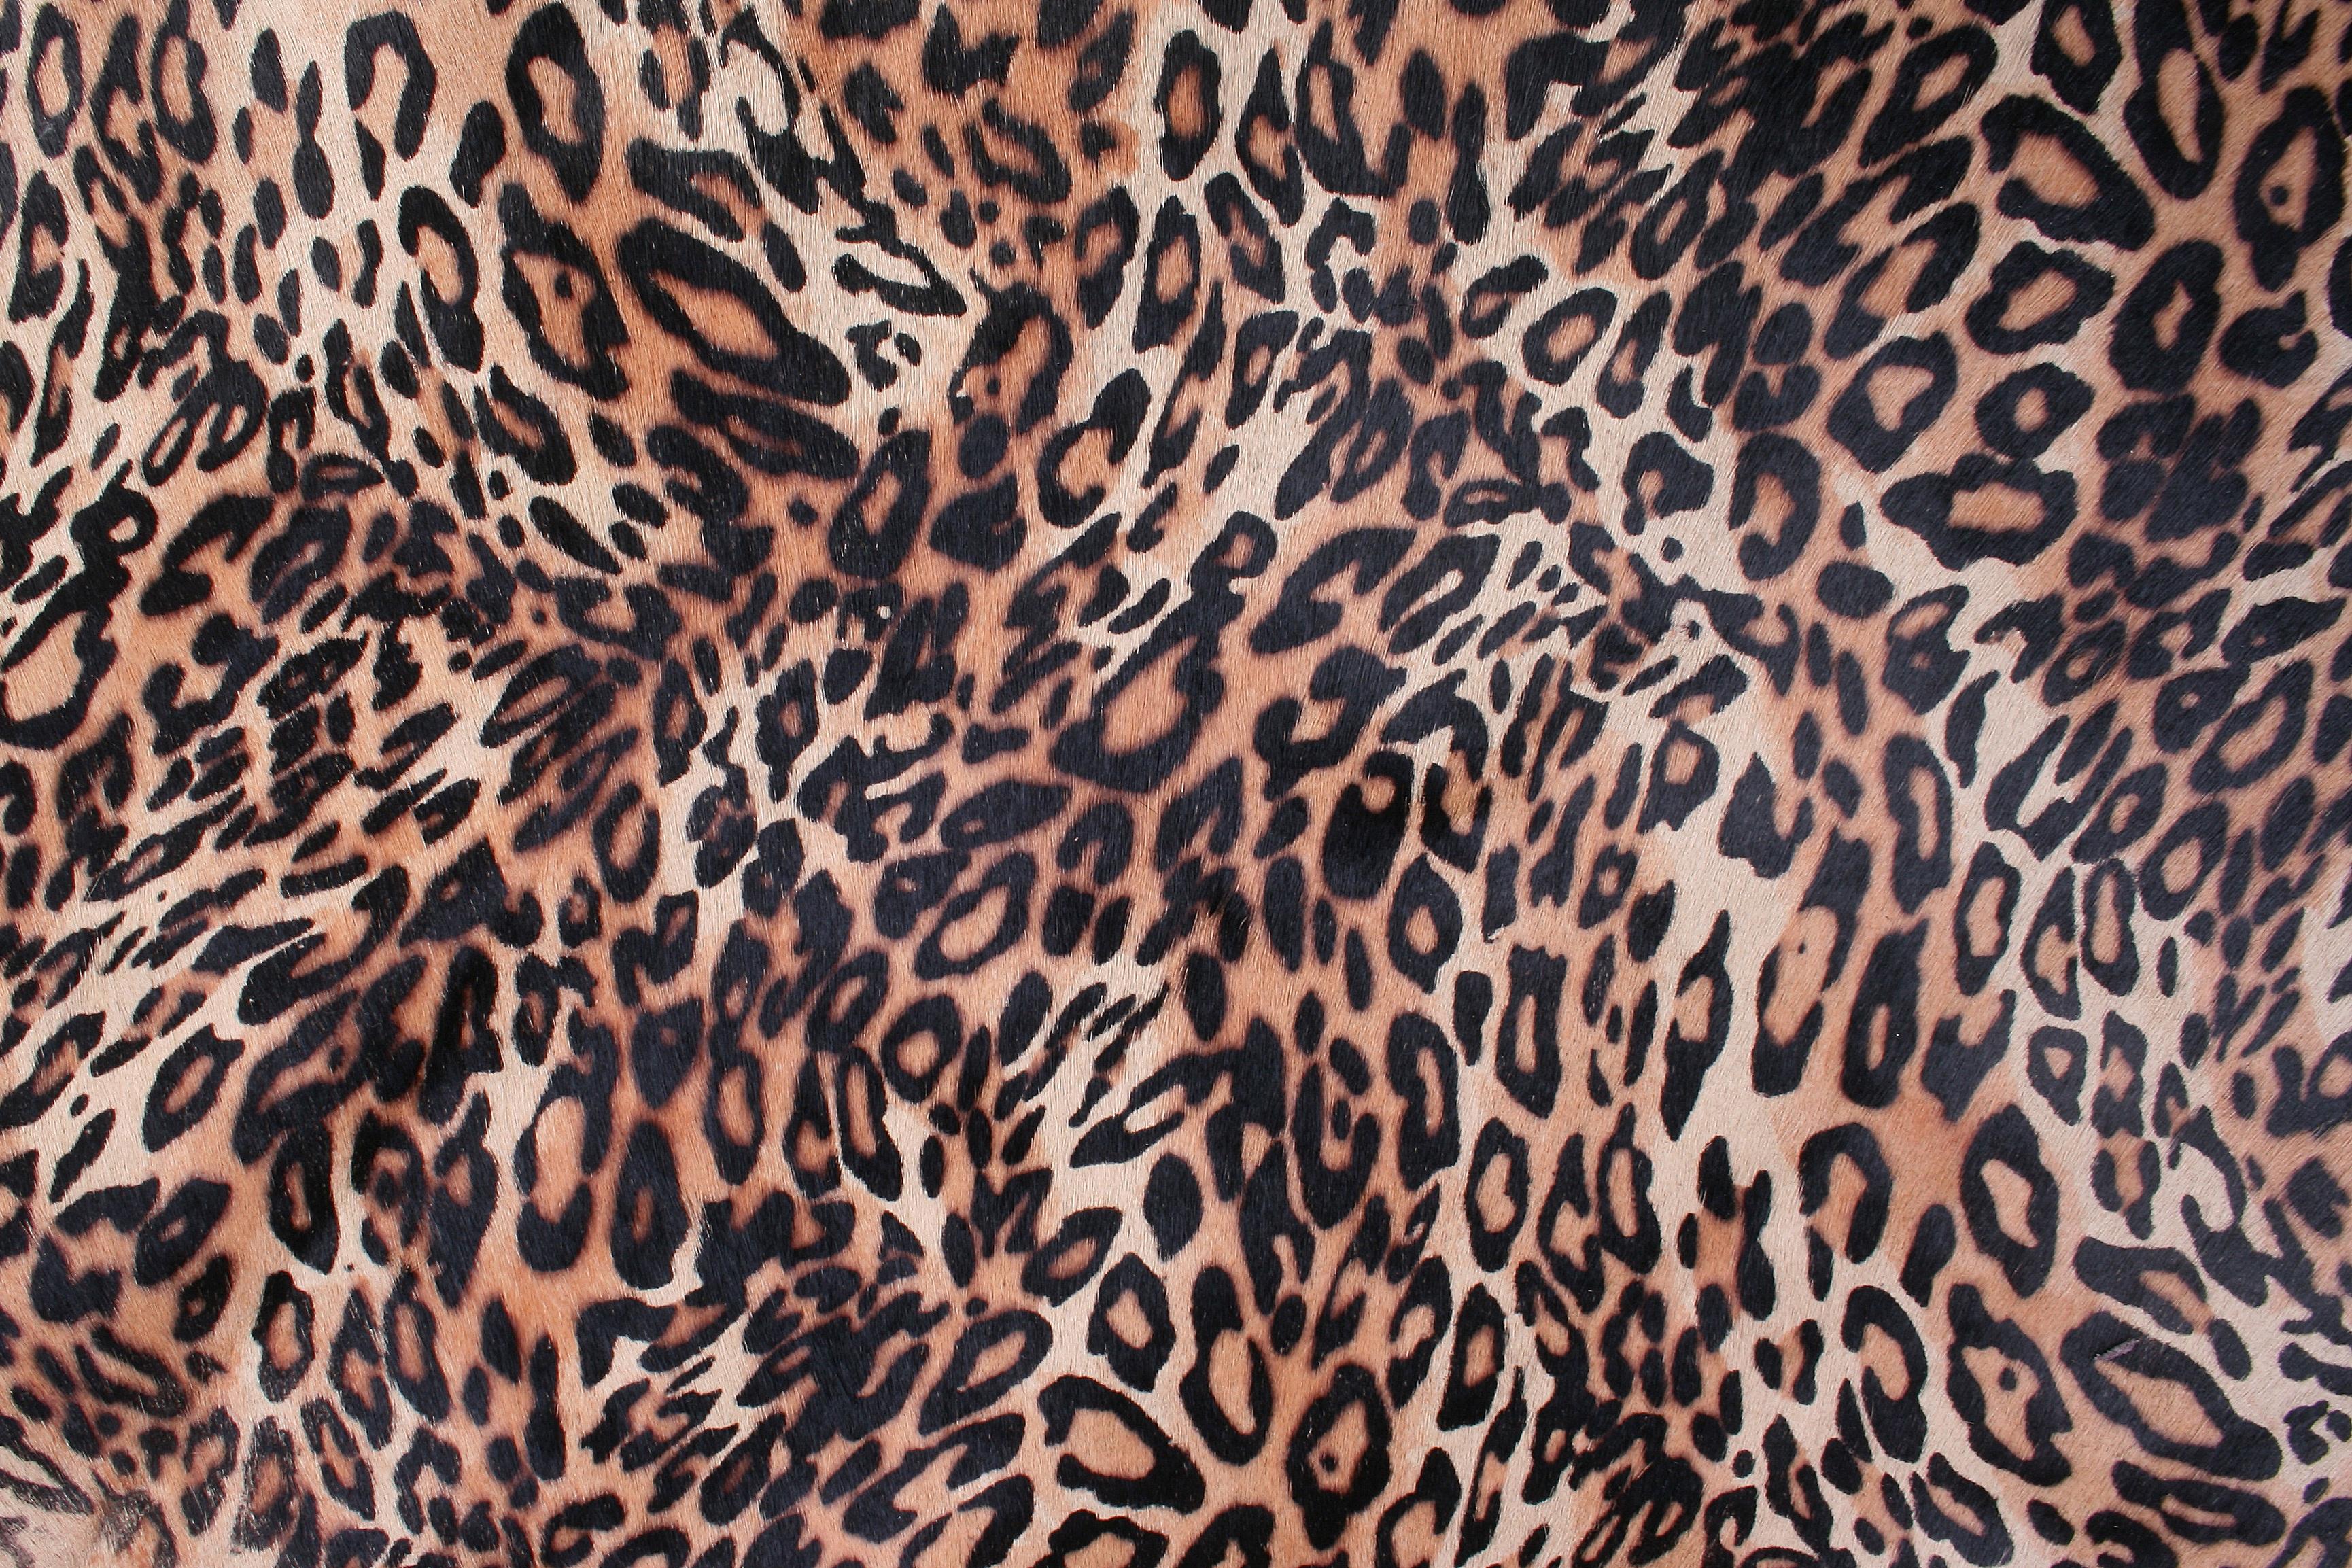 Free Images : fauna, close up, whiskers, vertebrate, jaguar, chiba, leather texture, big cats ...